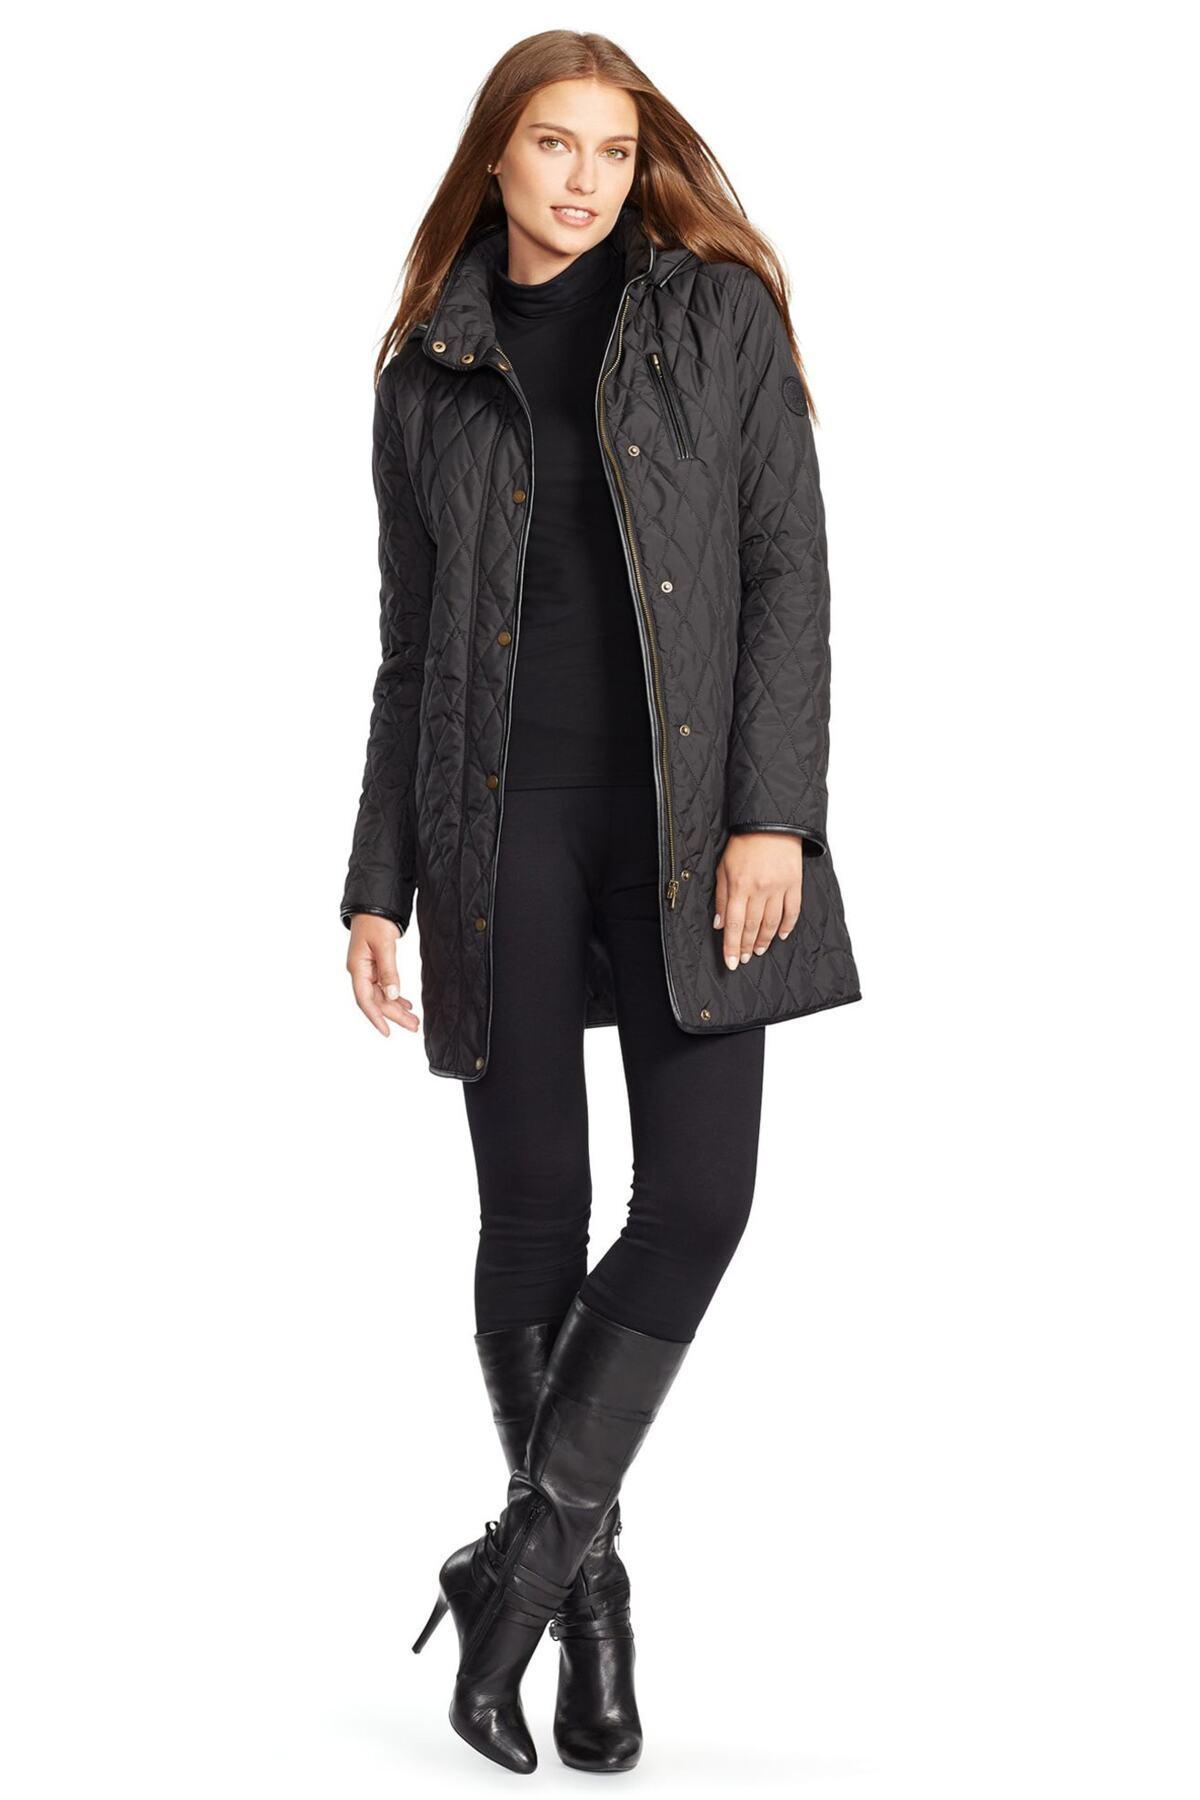 Ralph Lauren Leather Jacket Womens - Right Jackets